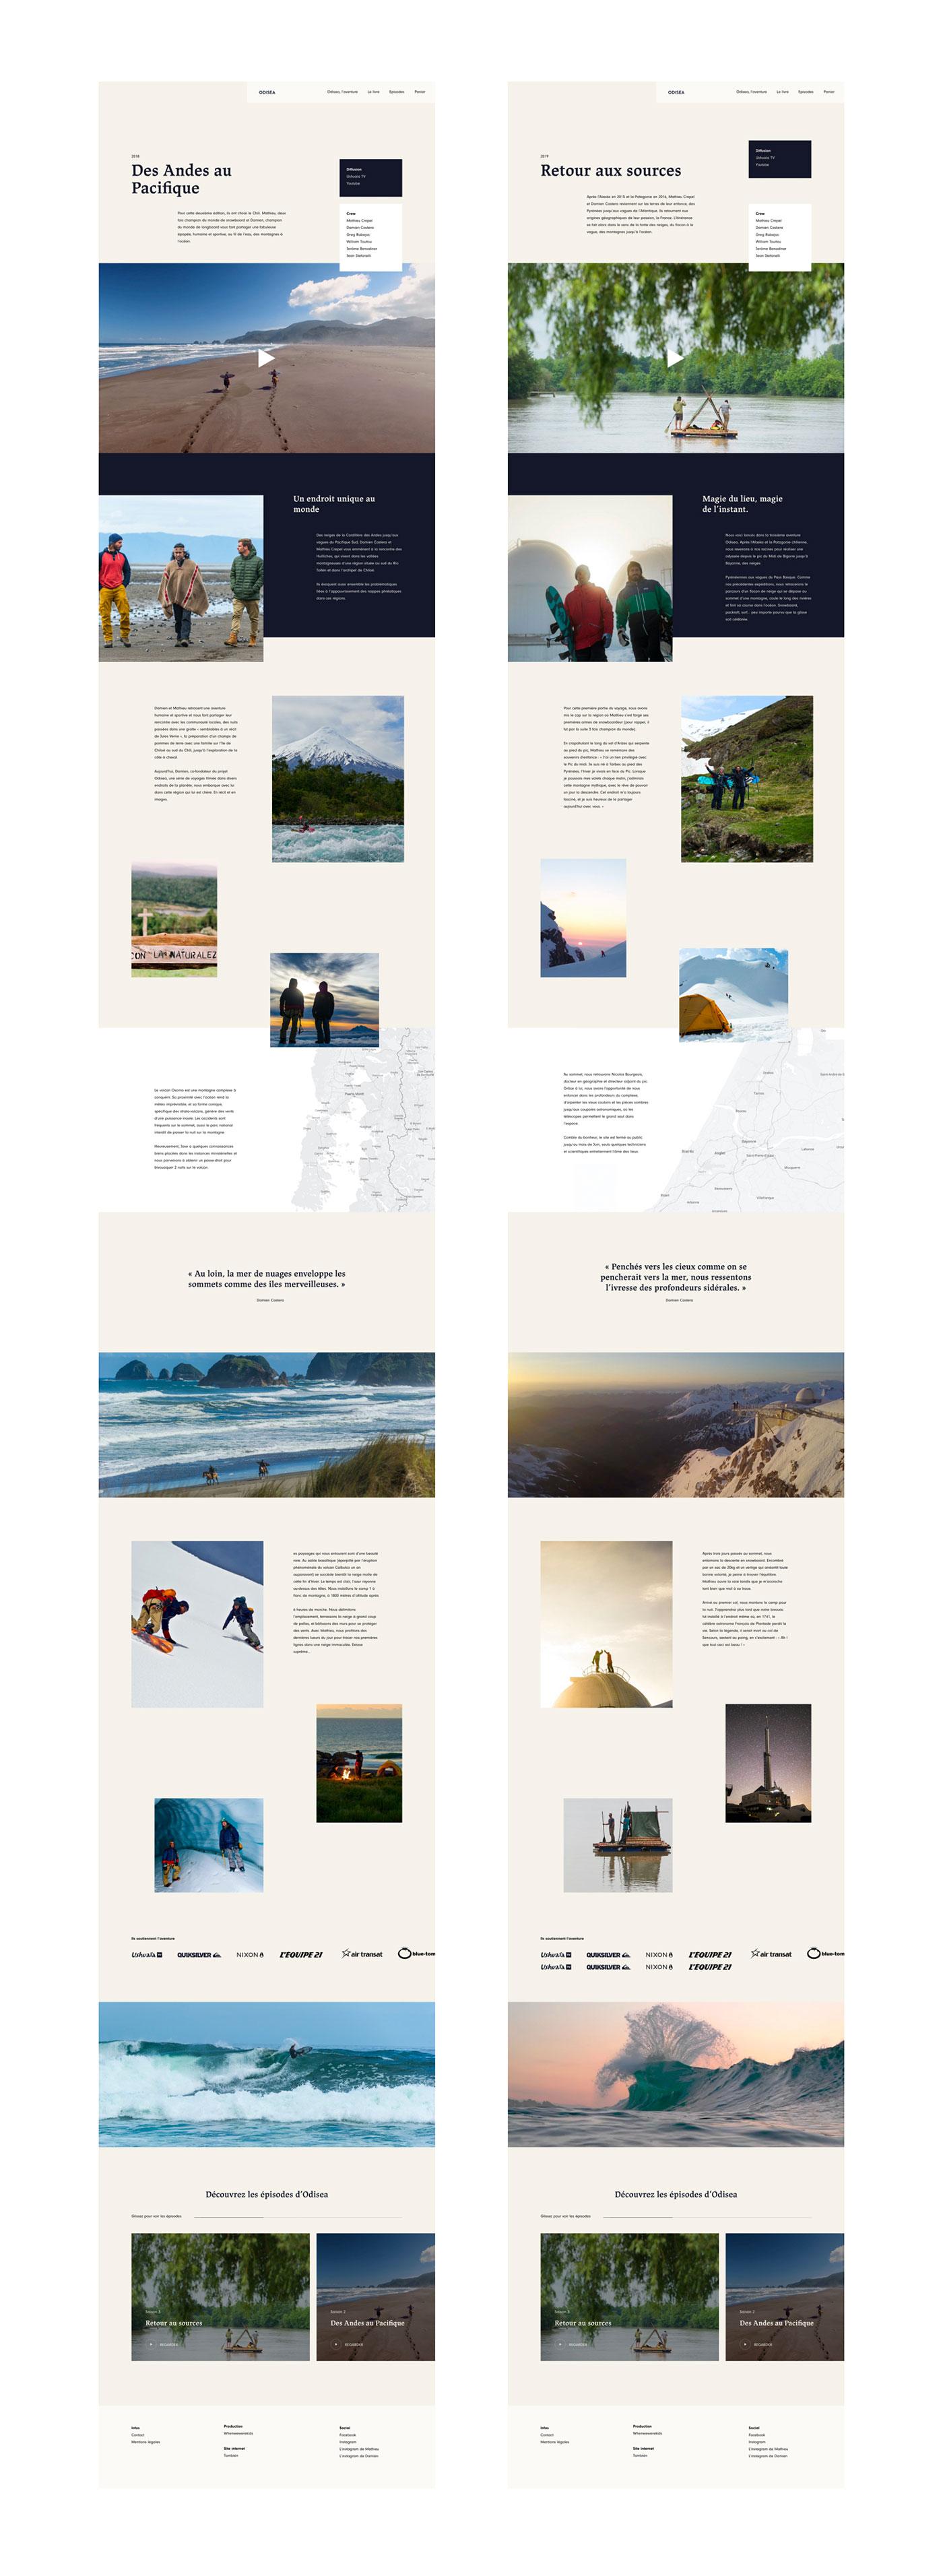 image-project-nine